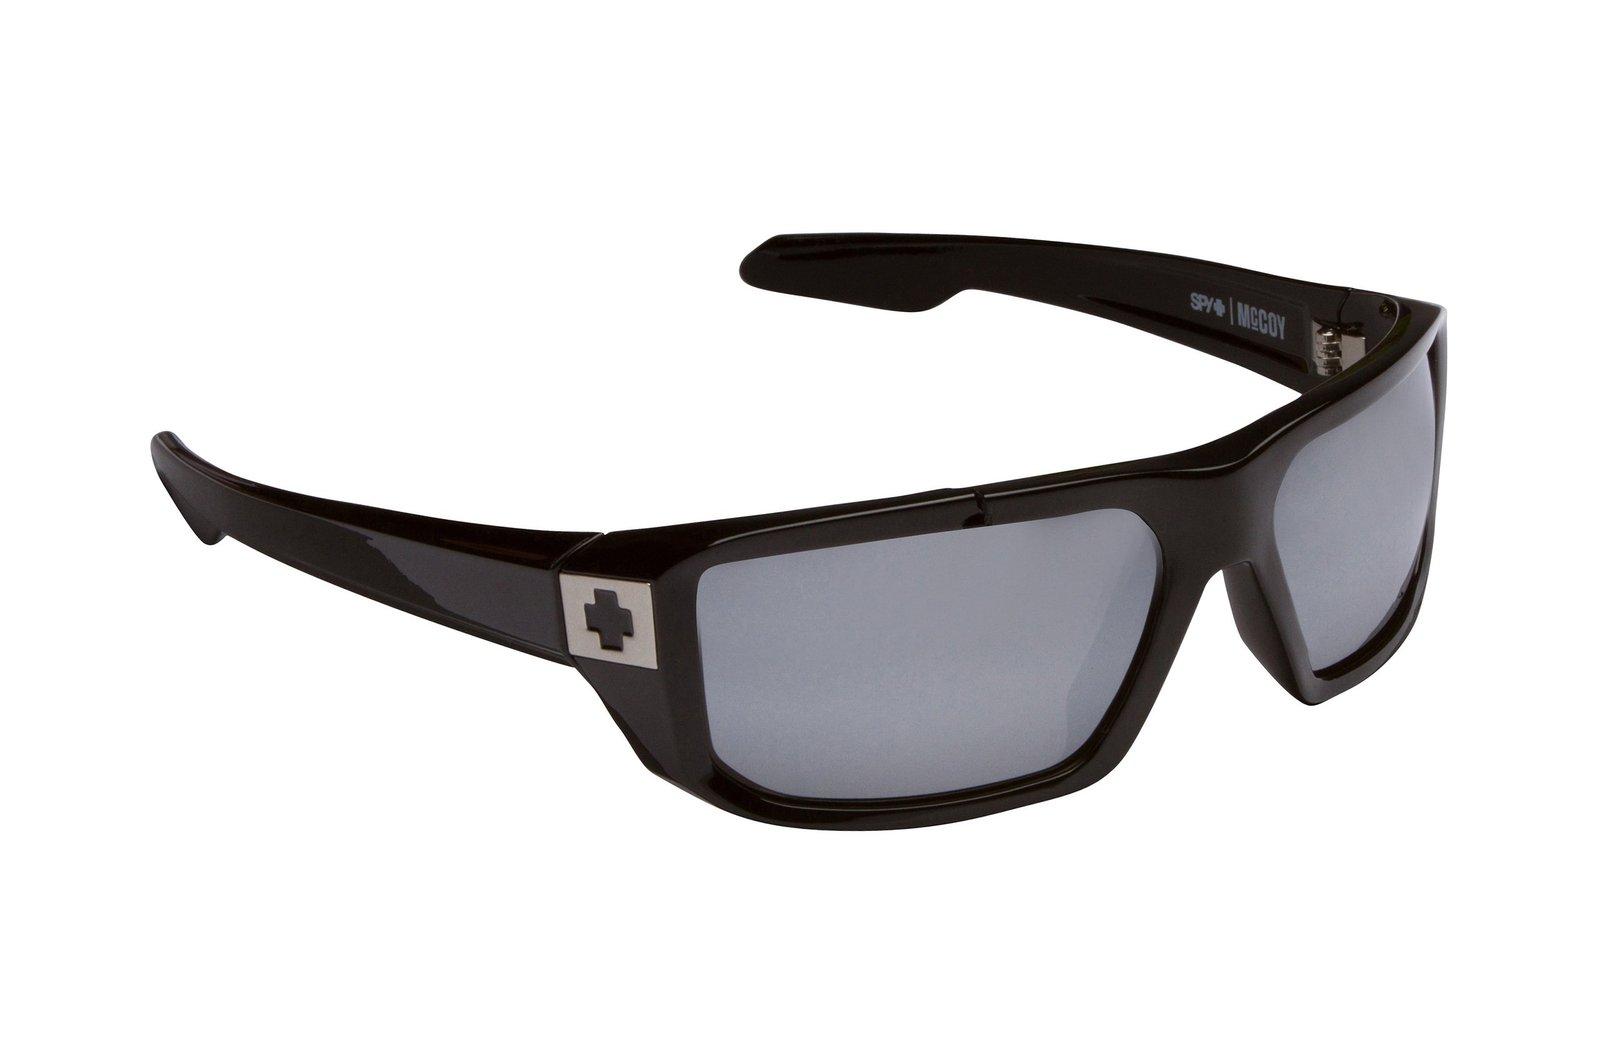 90475931697 ... New SEEK Replacement Lenses Spy Optics McCOY - Polarized Silver Mirror